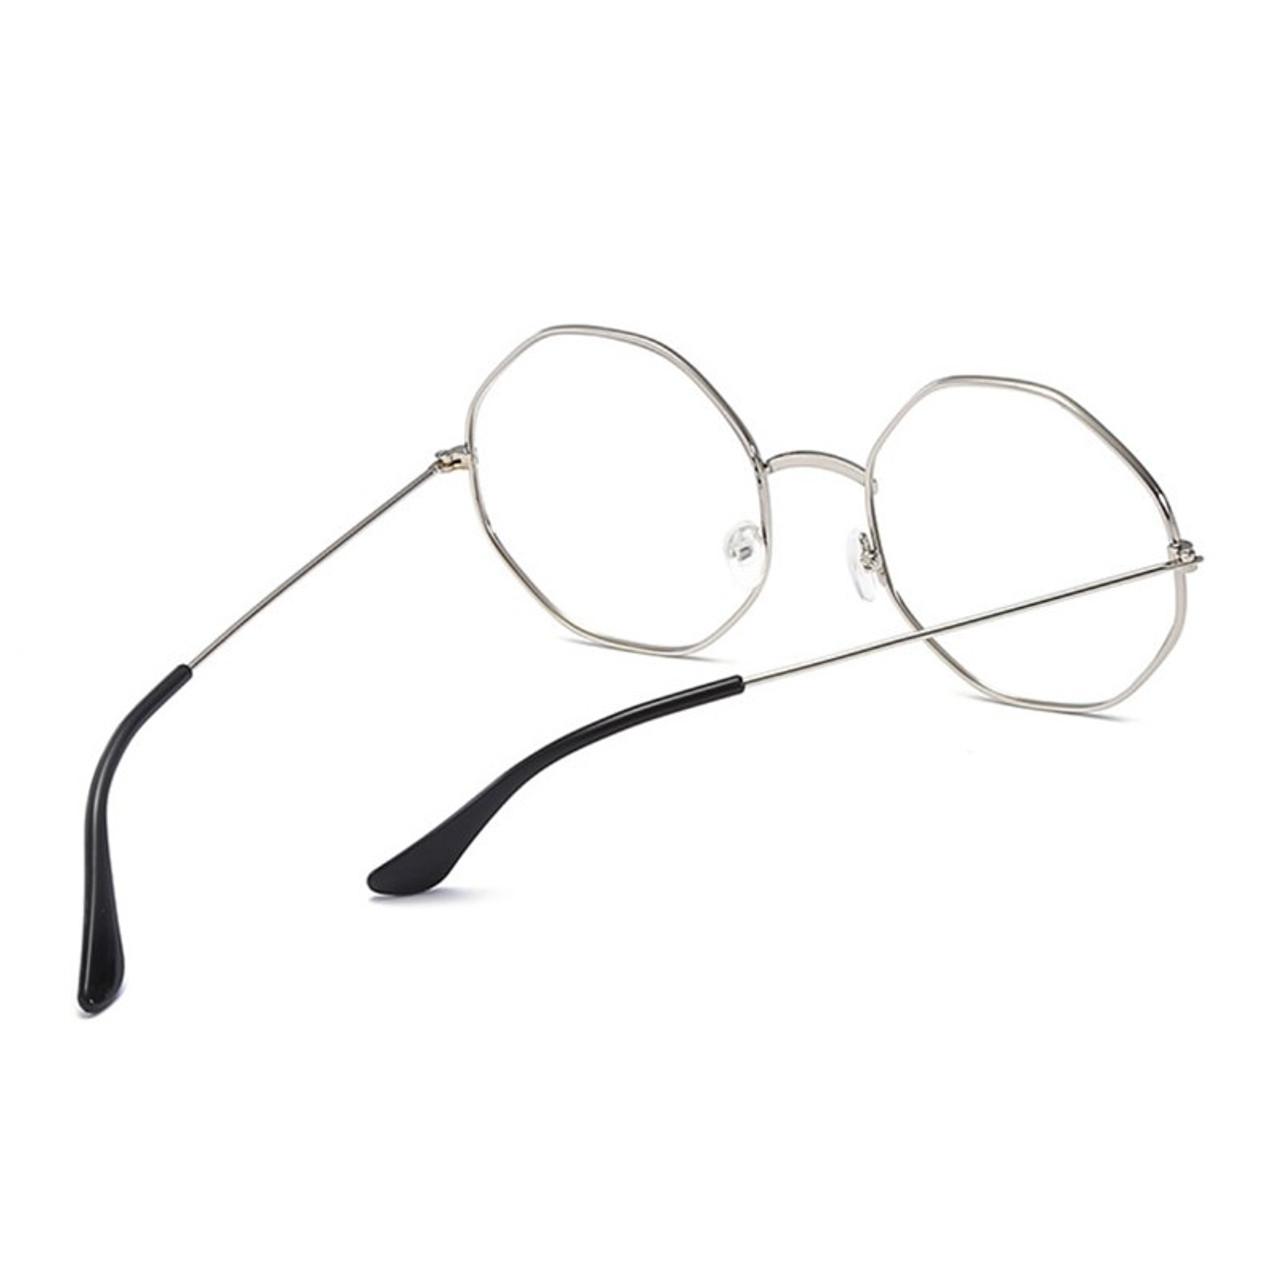 70e0bbfbc8a8 ... Glasses Round Spectacle Glasses Frame Sunglasses Men Women Vintage  Metal Mirror Sun Glasses Female Frames Optical ...